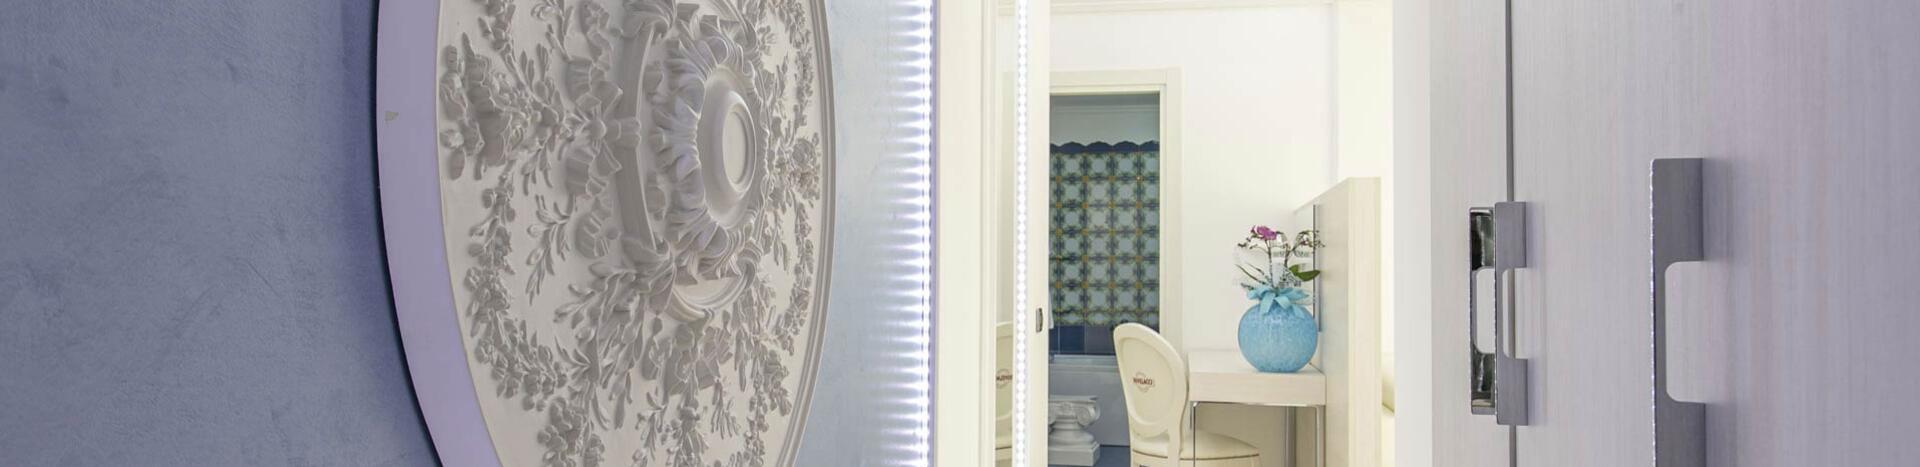 hotelparadisomilanomarittima ru a-relax 001